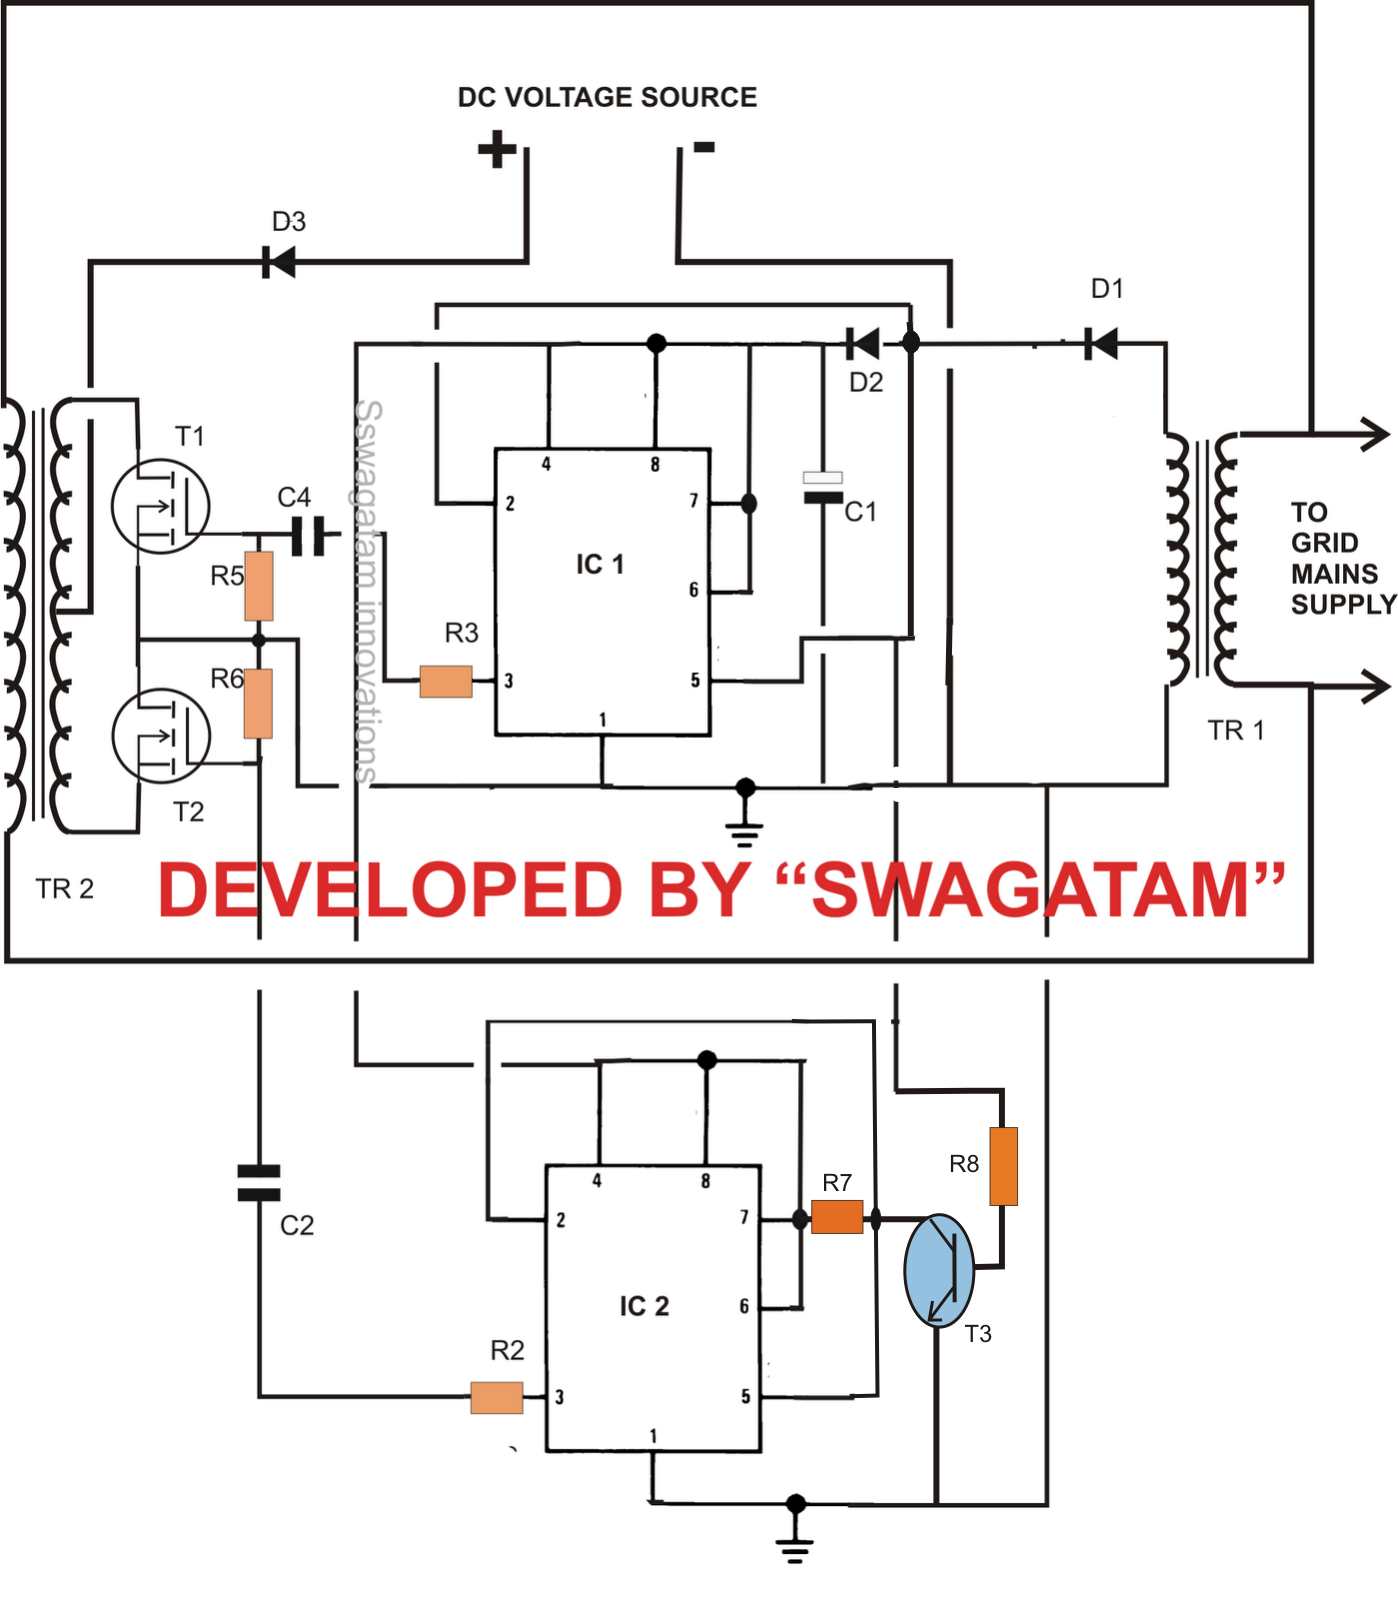 10kw Grid Tie Solar Wiring Diagram Designing A Grid Tie Inverter Circuit